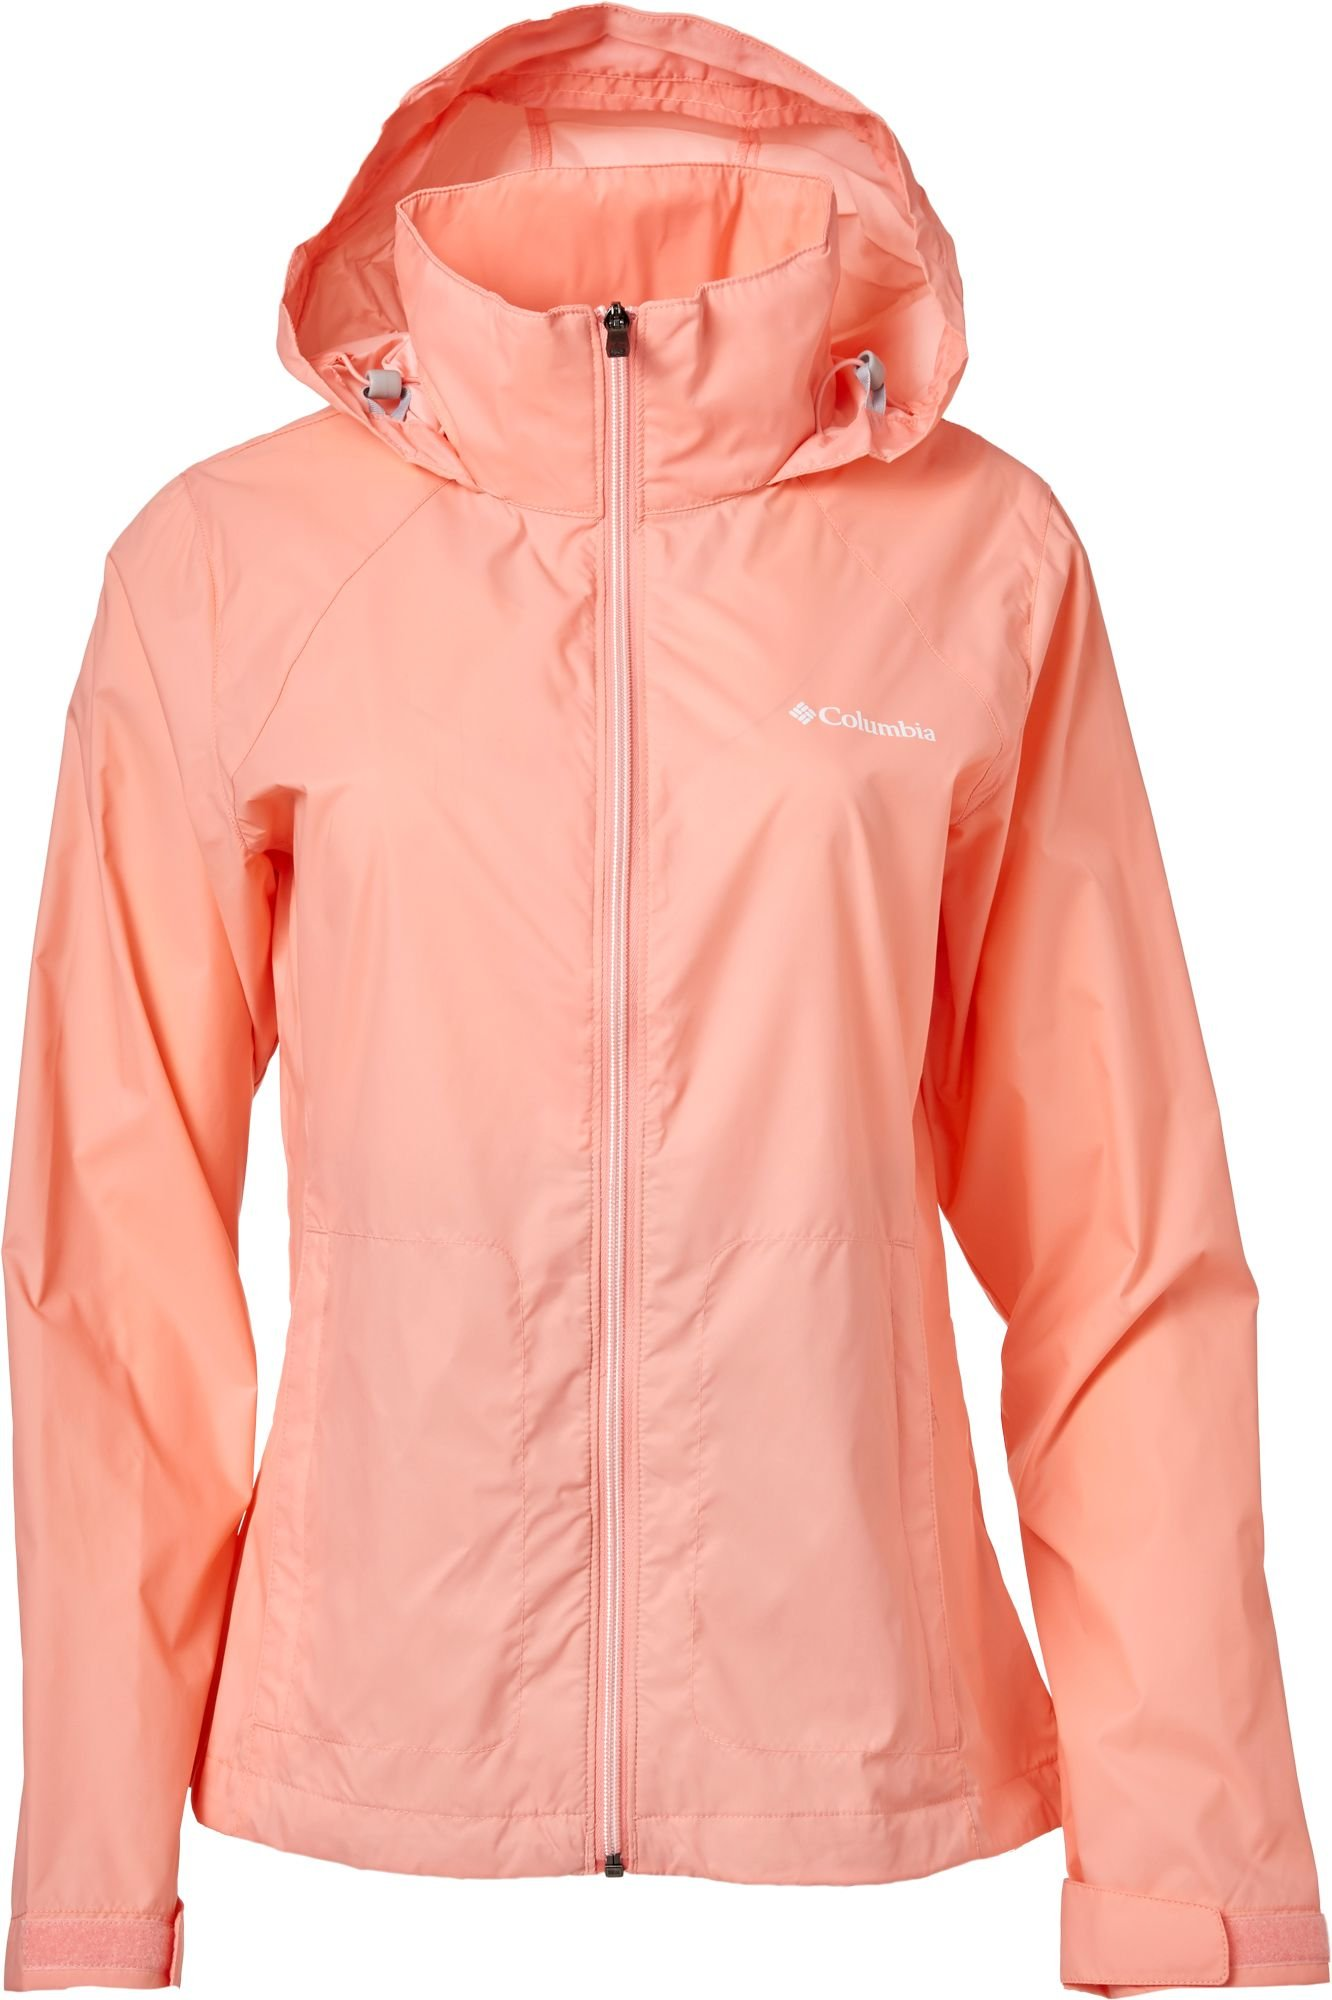 Columbia Women's Switchback Rain Jacket (Sorbet, Medium)